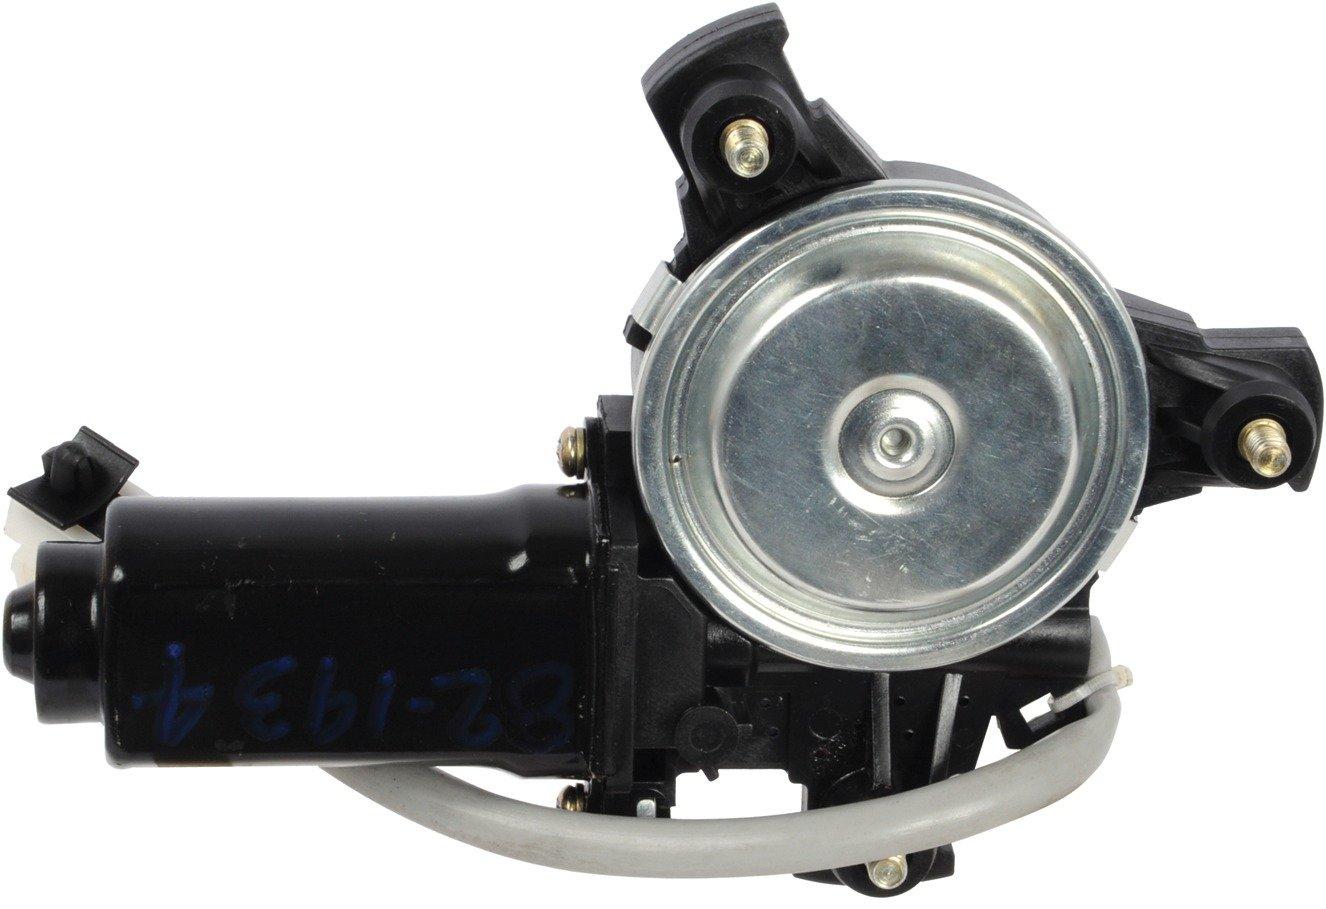 Cardone Select 82-1934 New Window Lift Motor